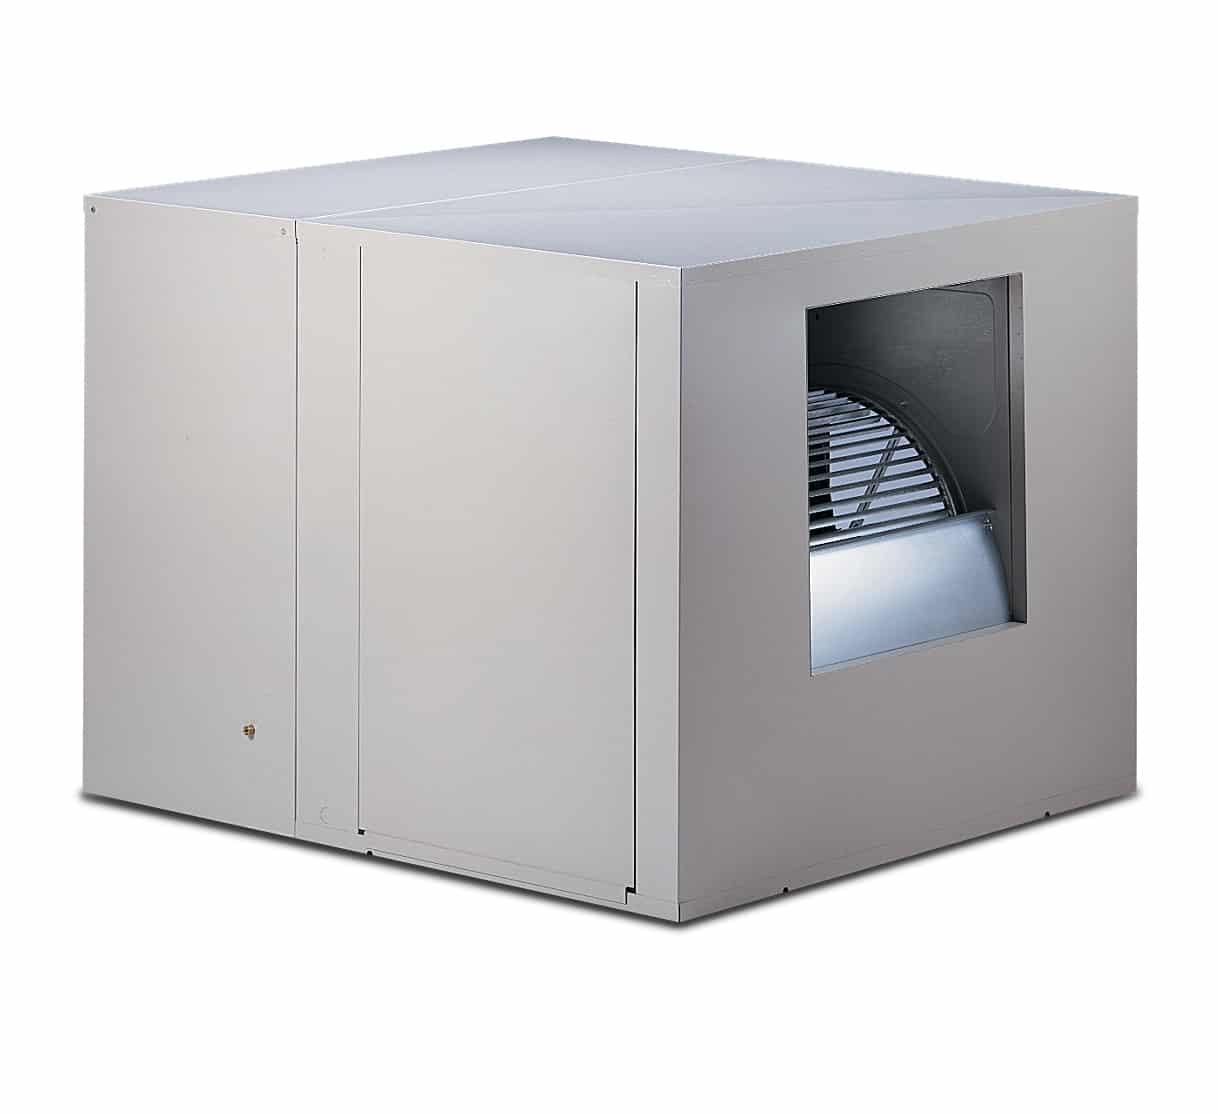 Phoenix Aerocool® Evaporative Cooler, 115/230 V, Up to 3875 CFM, Zinc Coated, Galvanized Sheet Steel, Down Draft